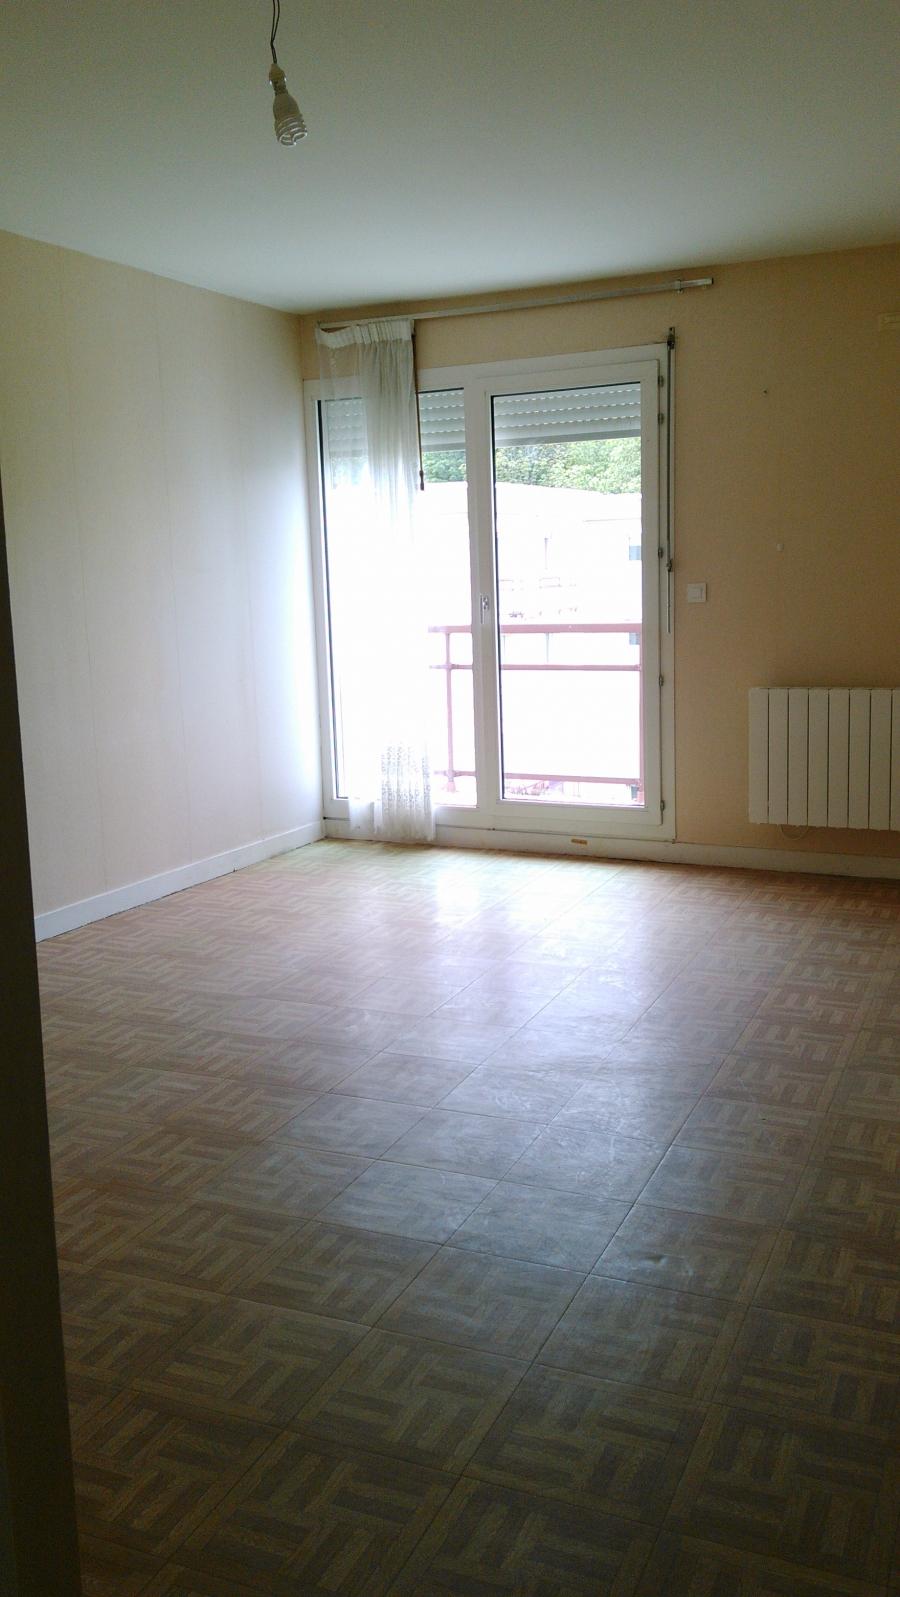 A vendre brest bel appartement t2 dans belle r sidence for Agence immobiliere brest